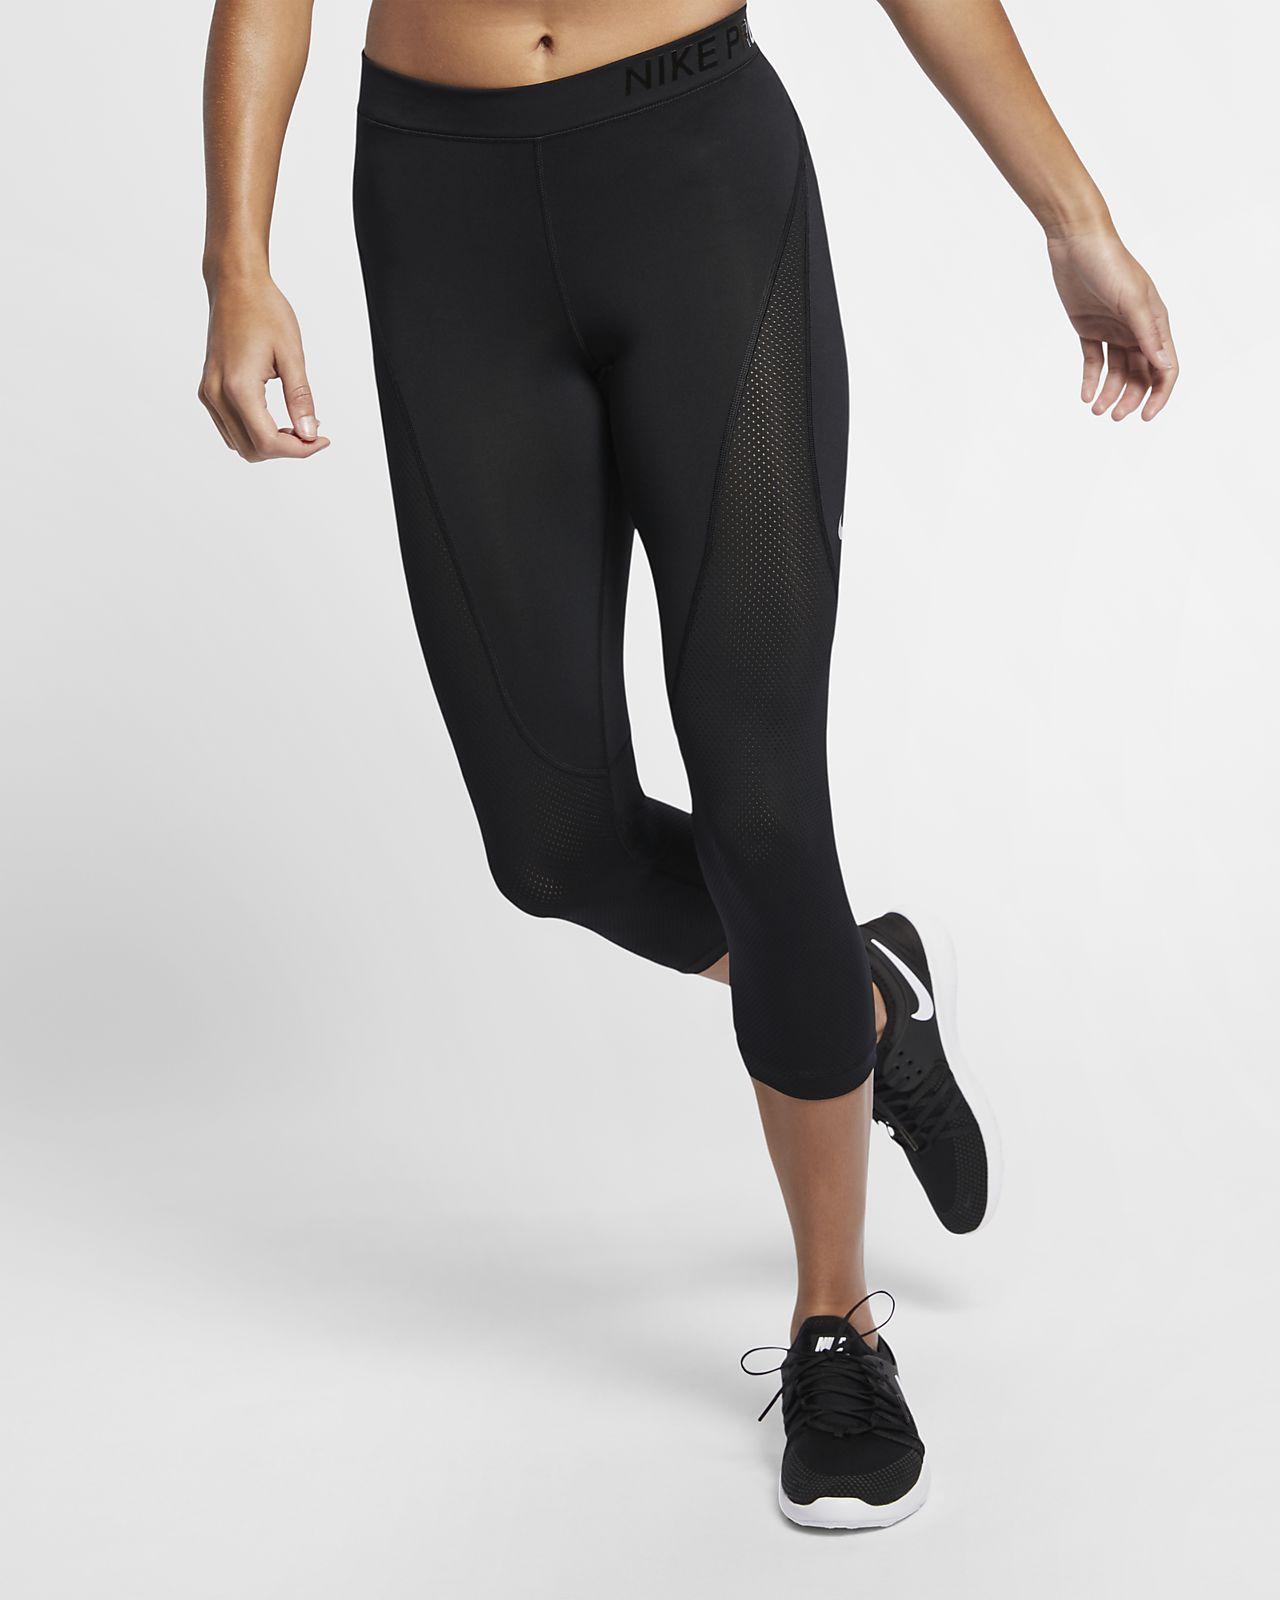 reputable site 2e2d9 a4e10 ... Leggings da training ridotti a vita media Nike Pro HyperCool - Donna